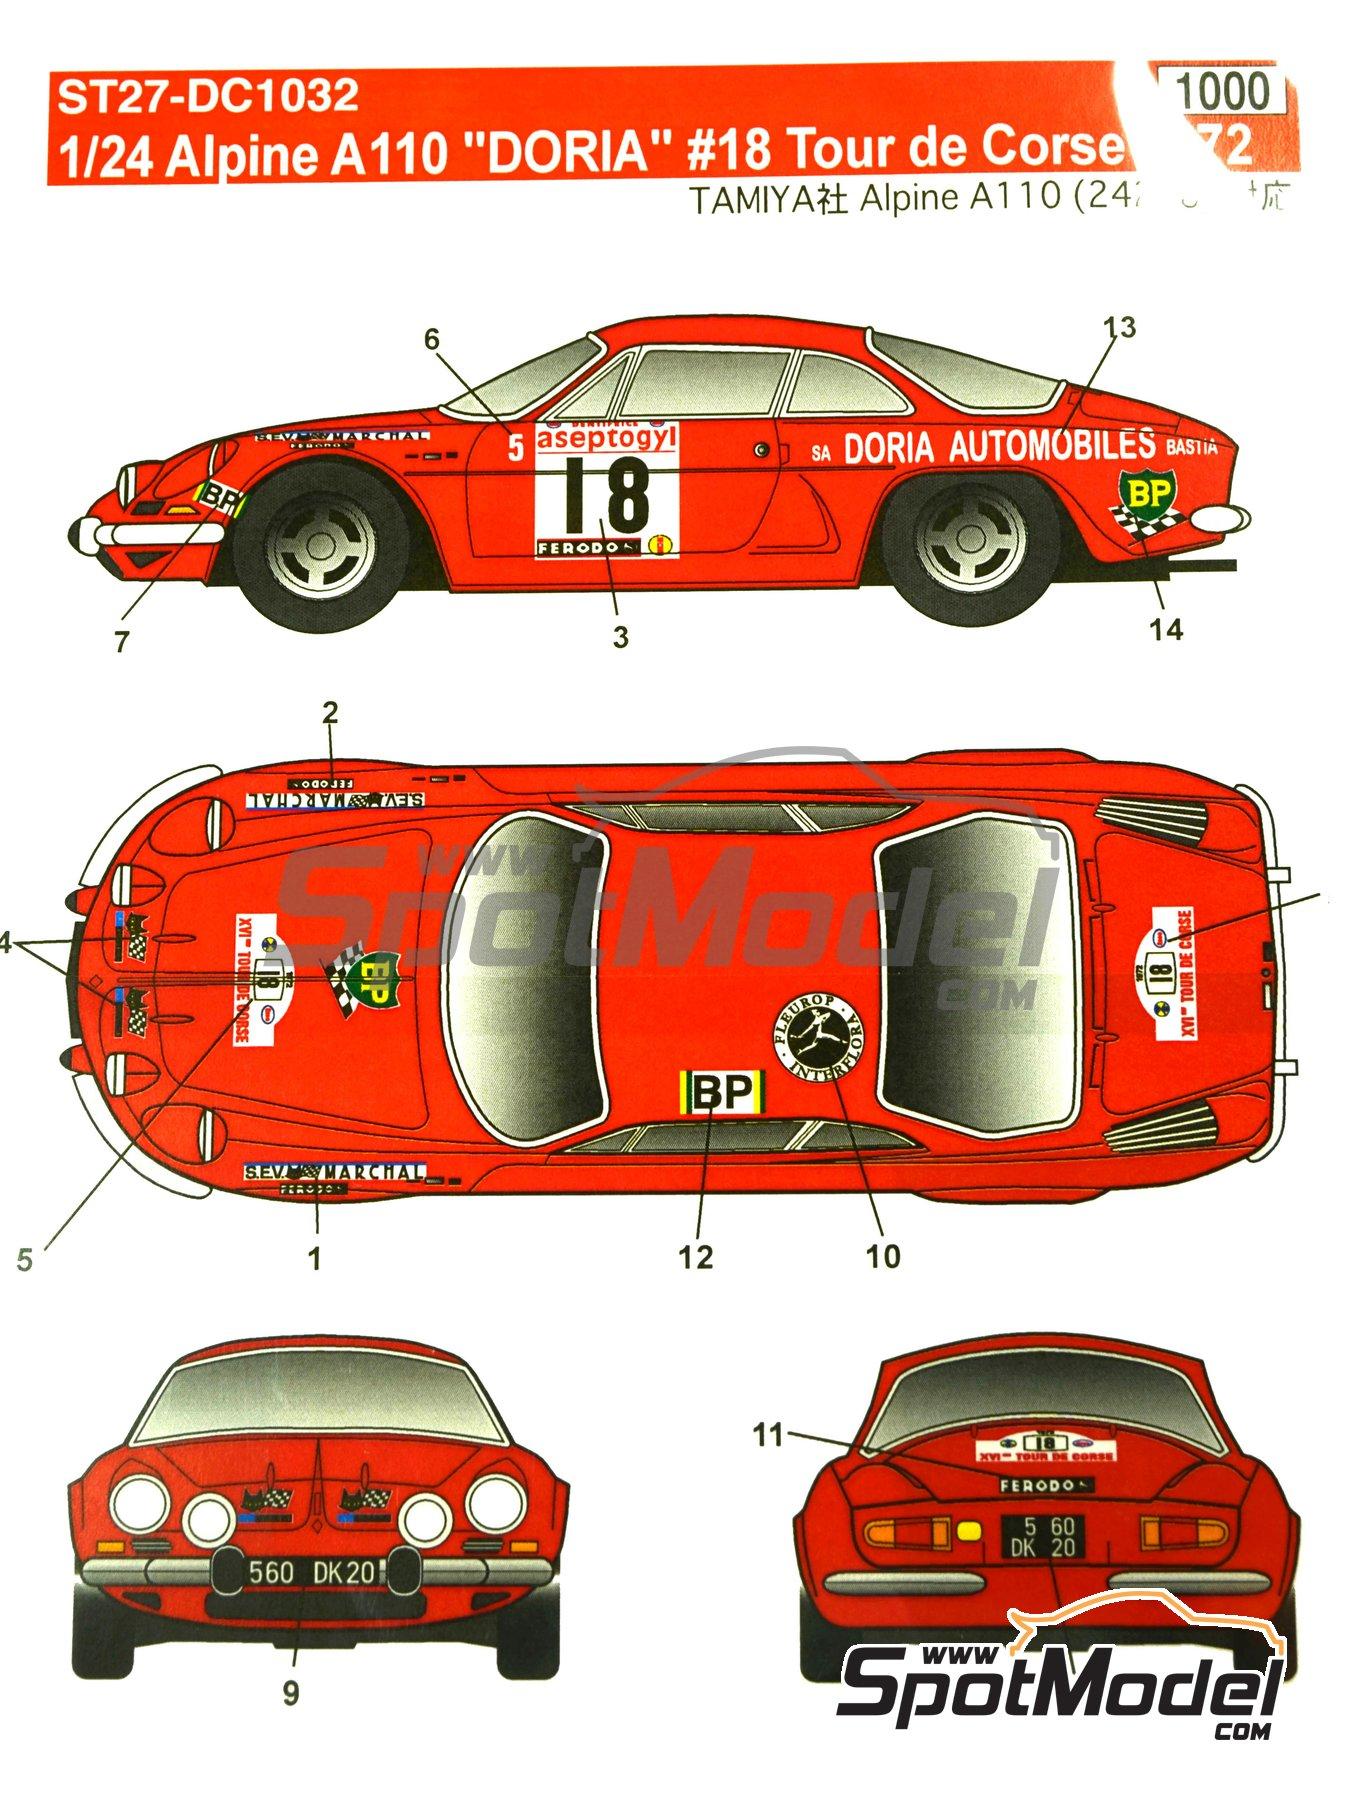 Renault Alpine A110 Doria - Rally Tour de Corse 1972 | Decoración en escala1/24 fabricado por Studio27 (ref.ST27-DC1032) image